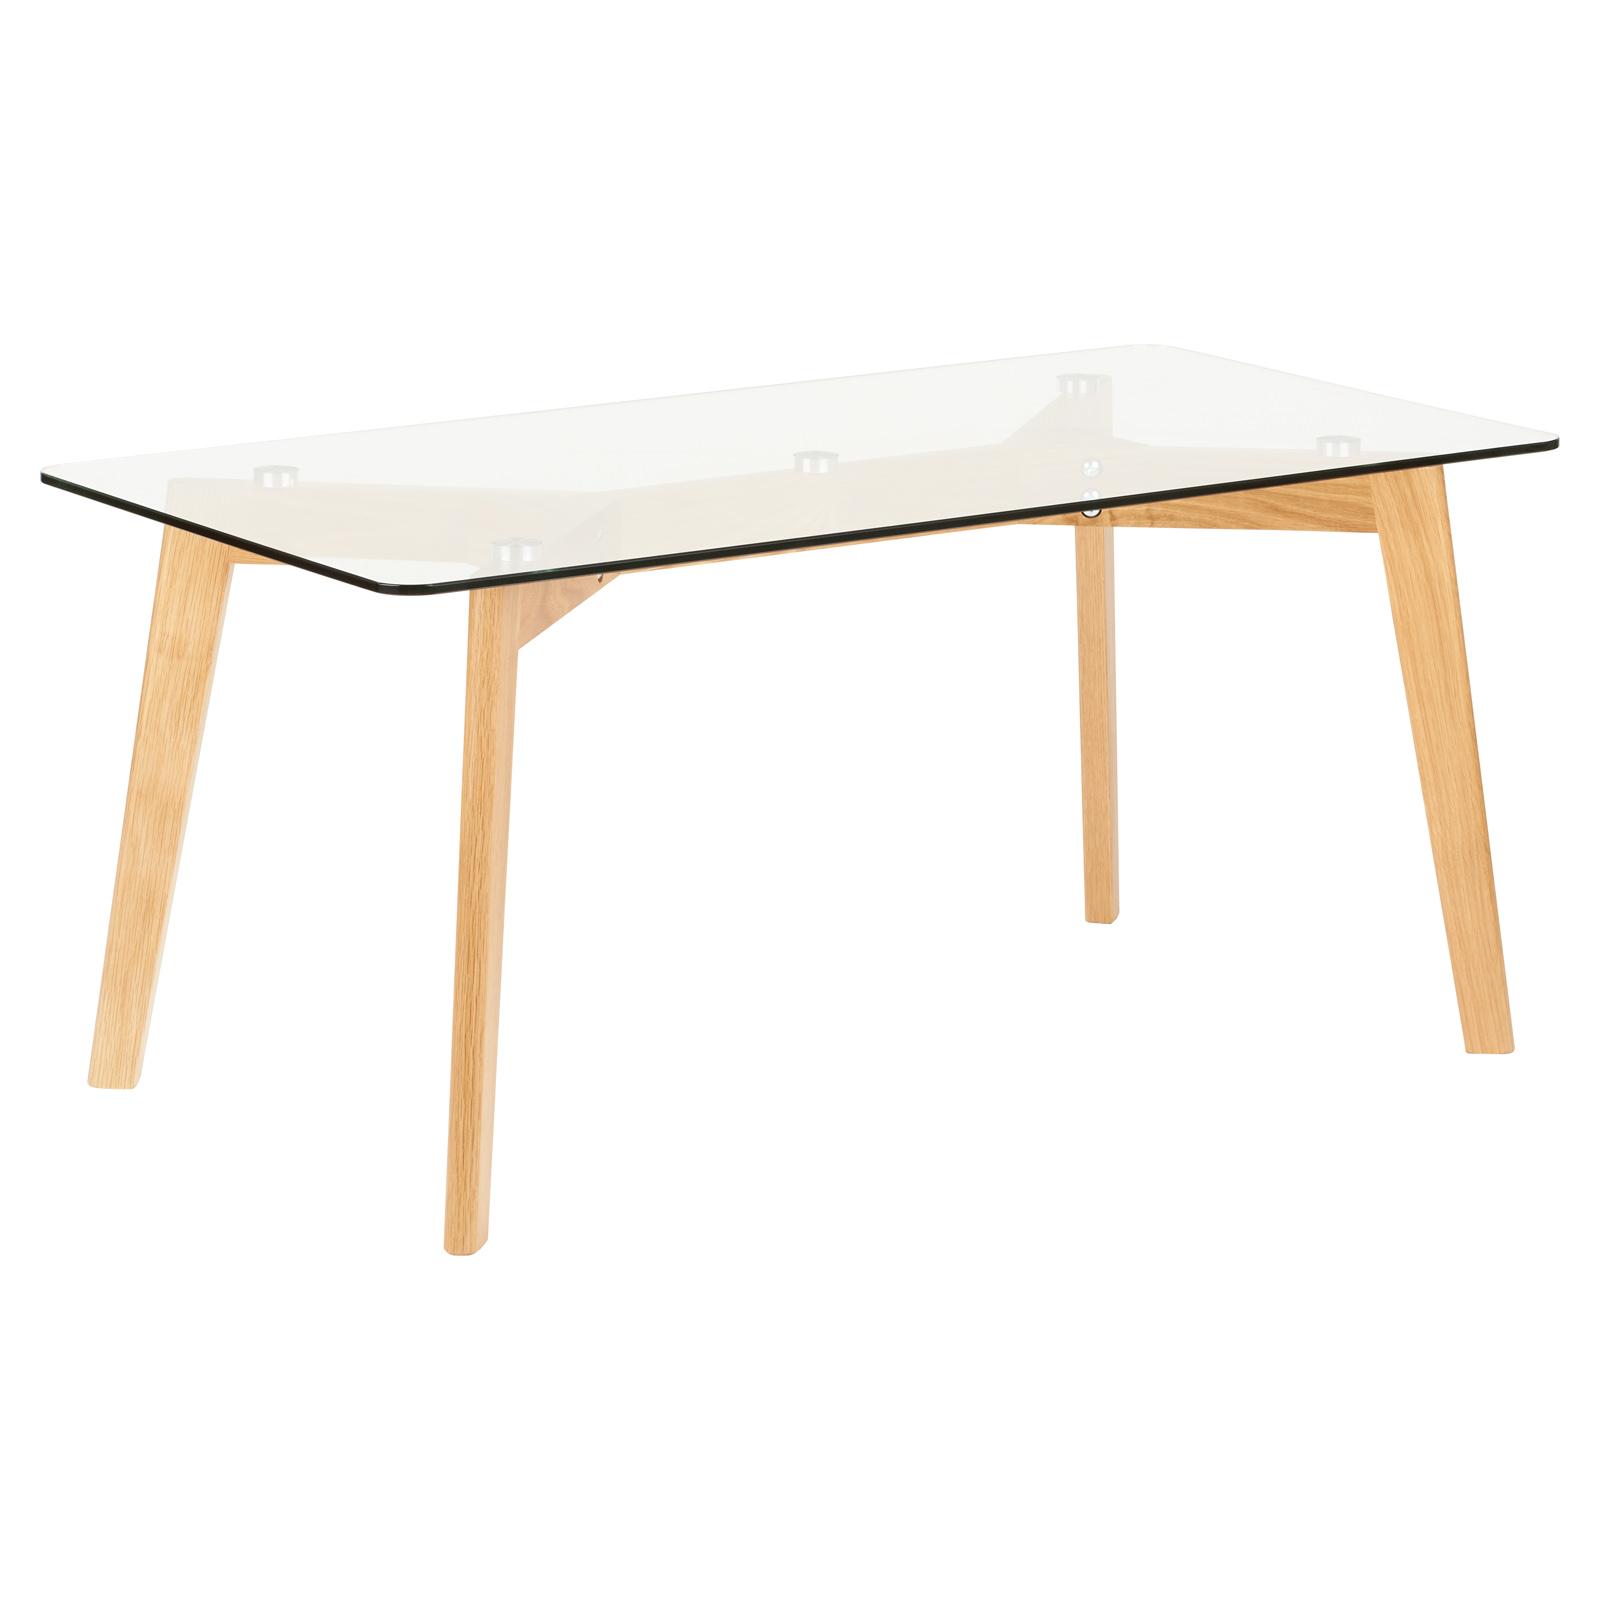 Ebay Oak And Glass Coffee Table: HARTLEYS SOLID OAK & GLASS RECTANGULAR MODERN WOOD SIDE